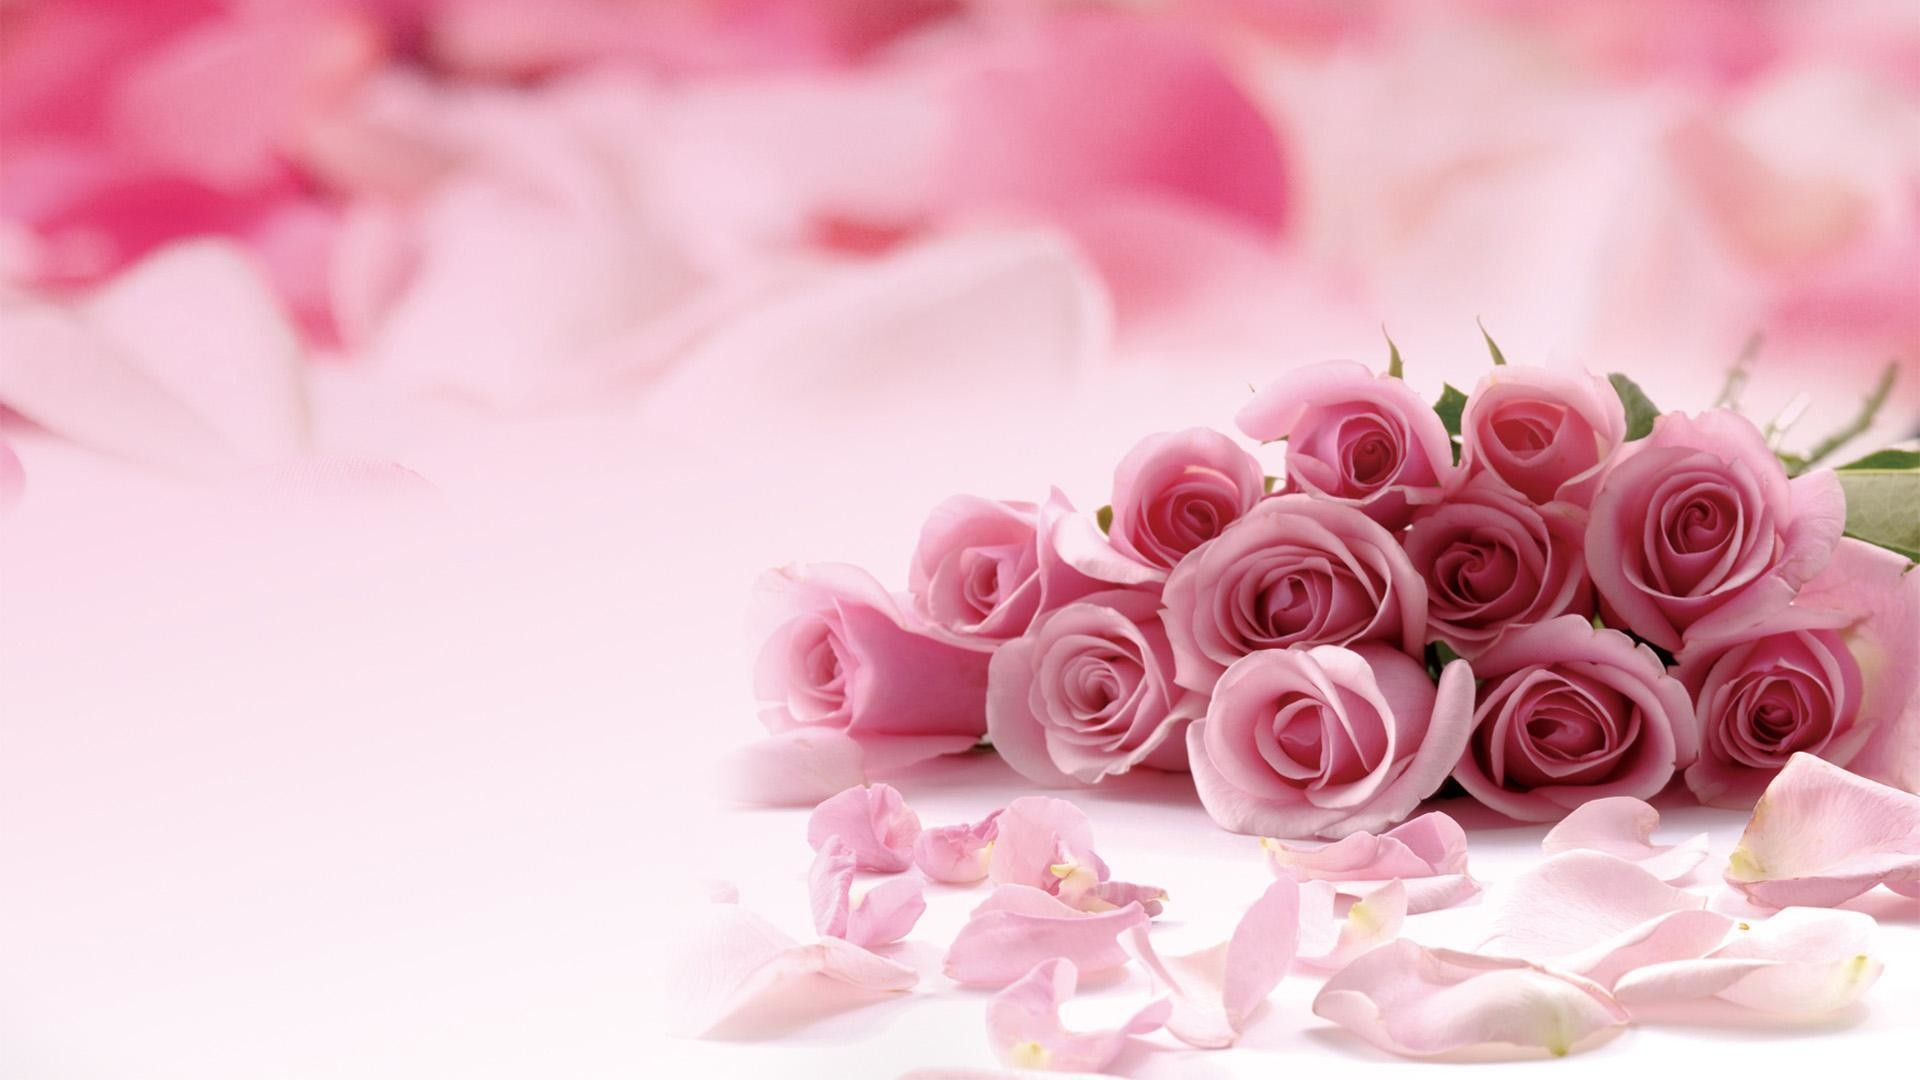 Pink-roses-picture-HD-Desktop-Wallpaper-pink purple .